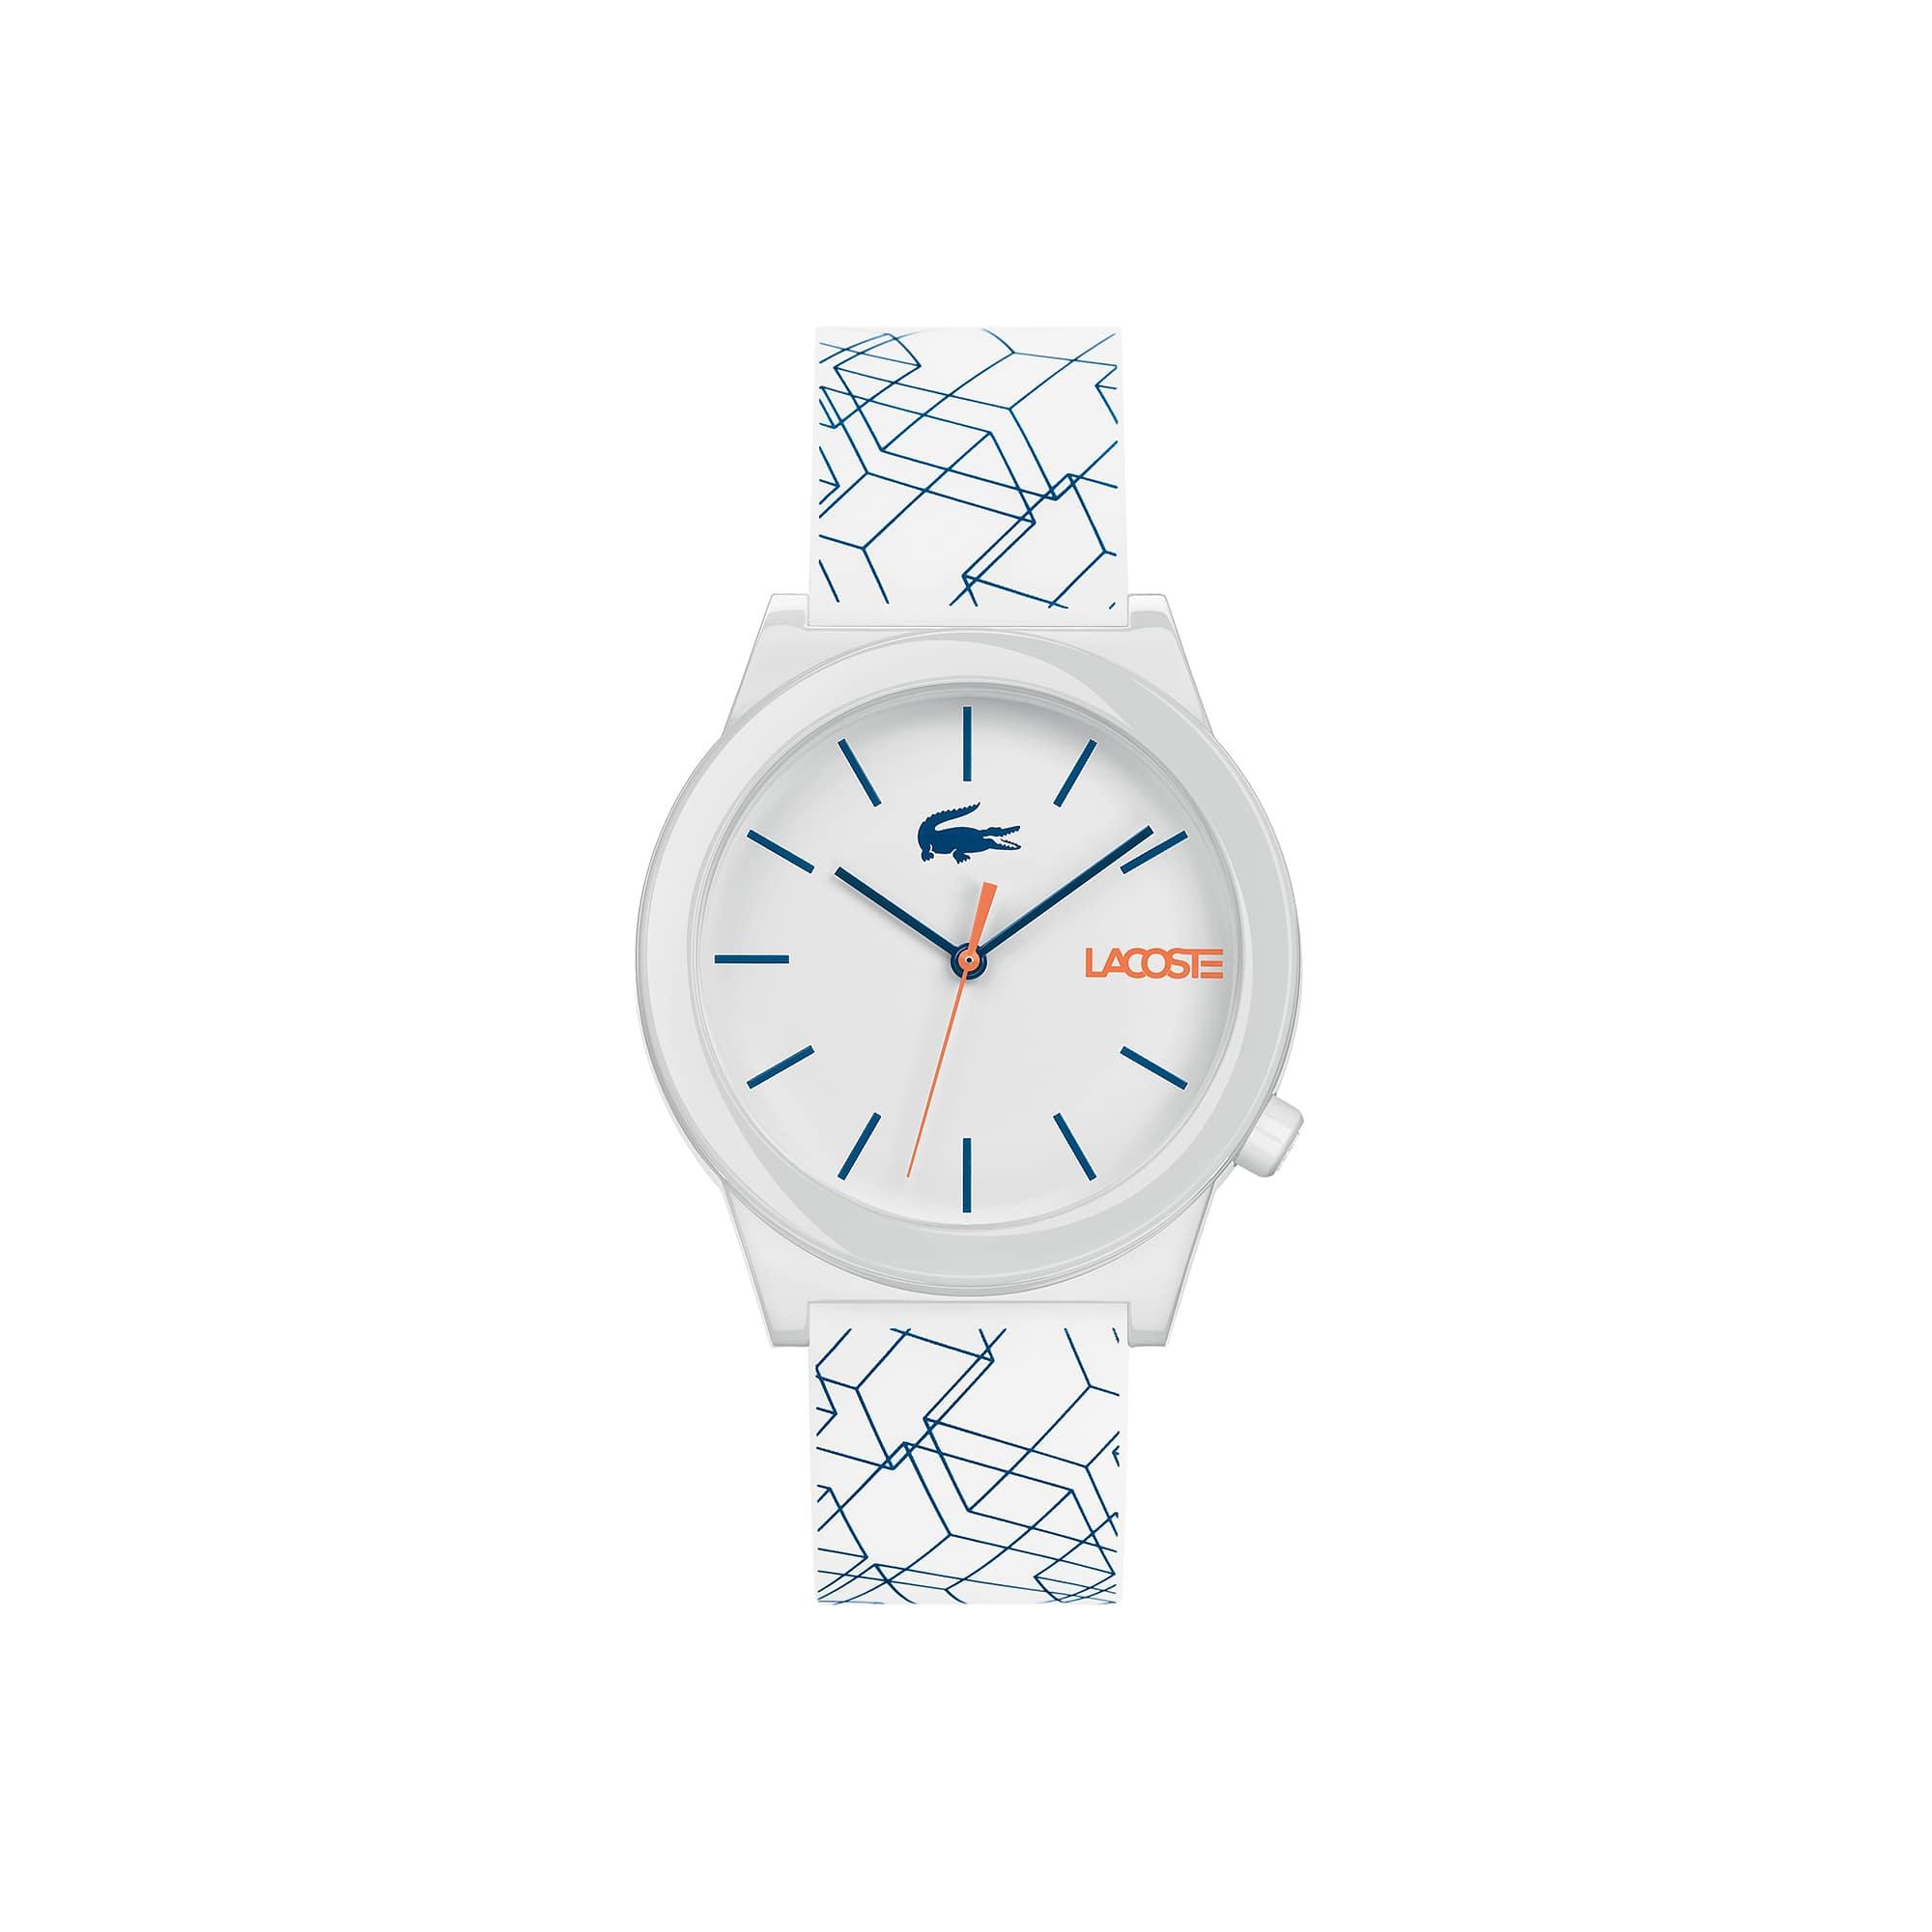 Reloj de Hombre Motion con Correa de Silicona Blanca